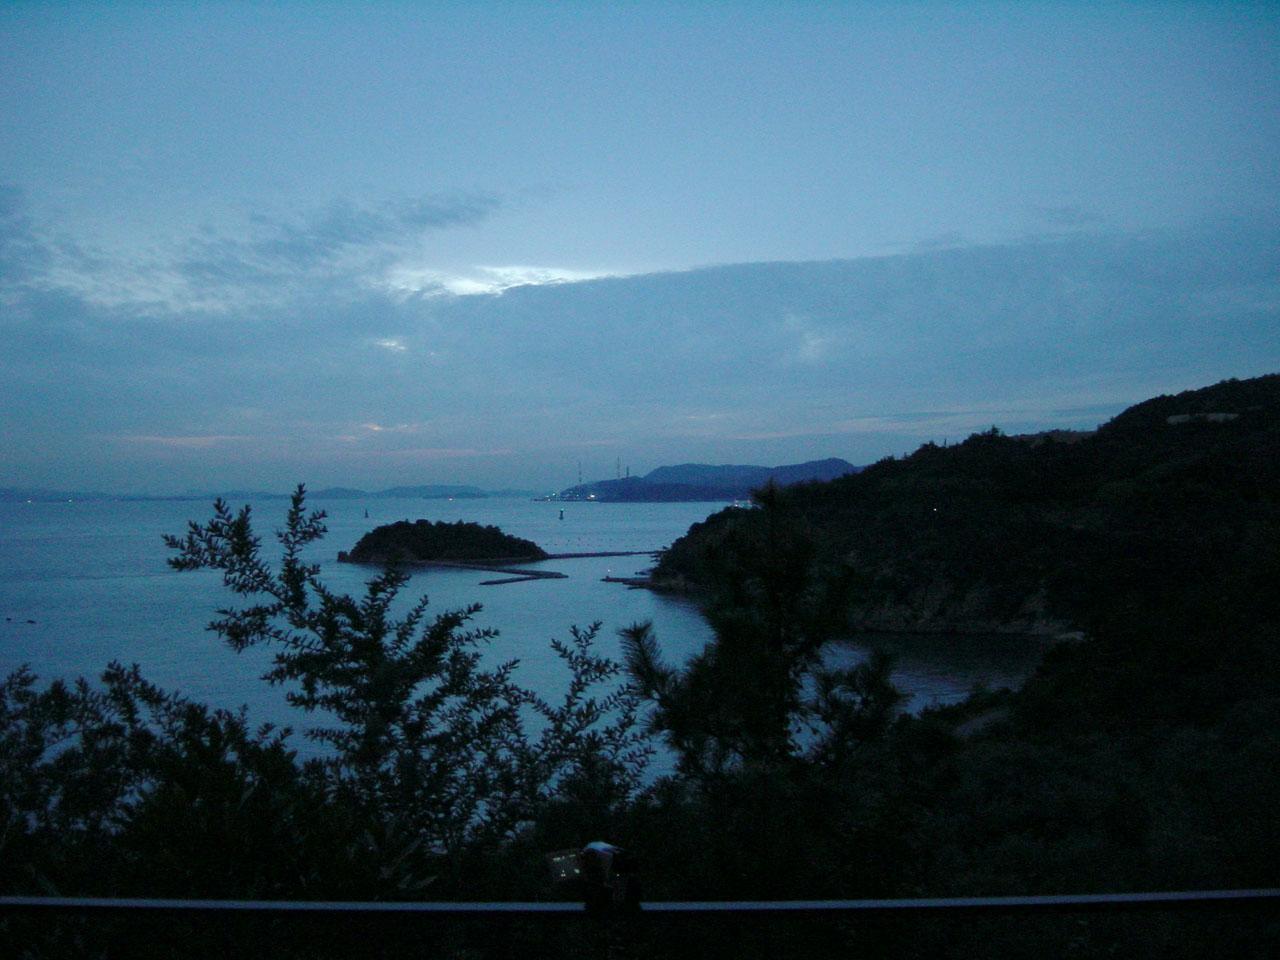 naoshima mer 31.10.2002